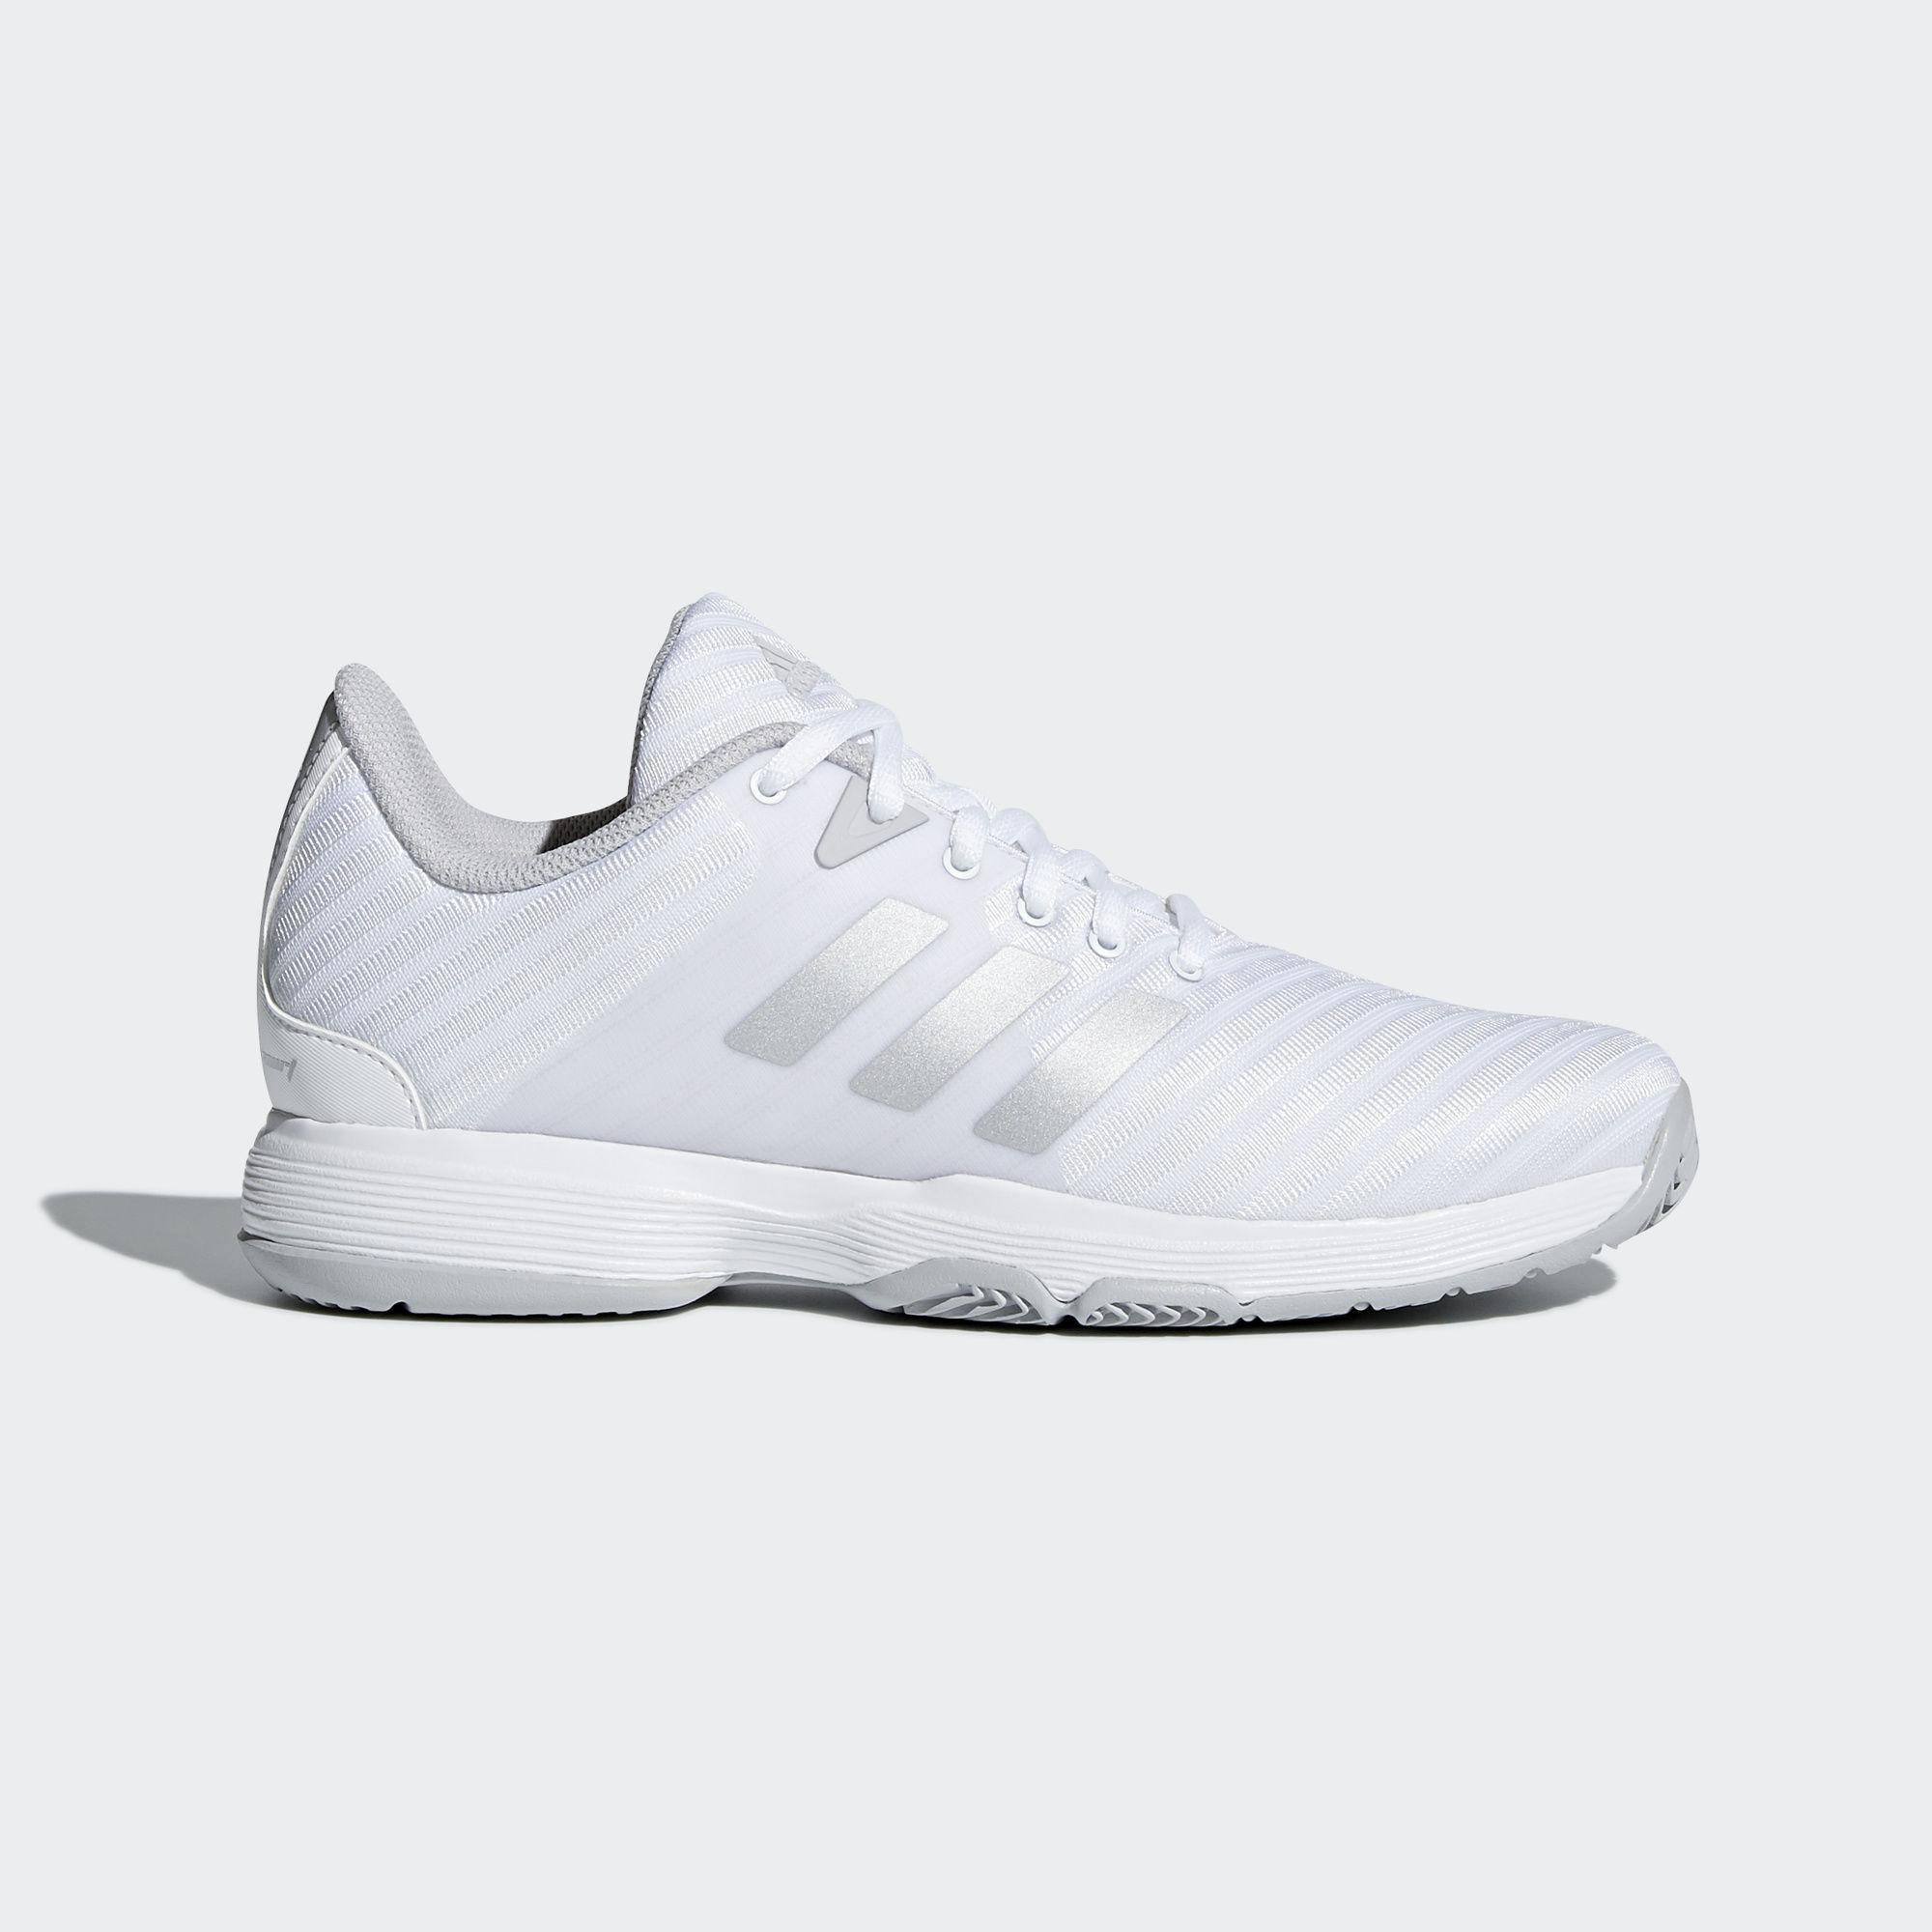 Womens Tennis Court Shoes Adidas Barricade